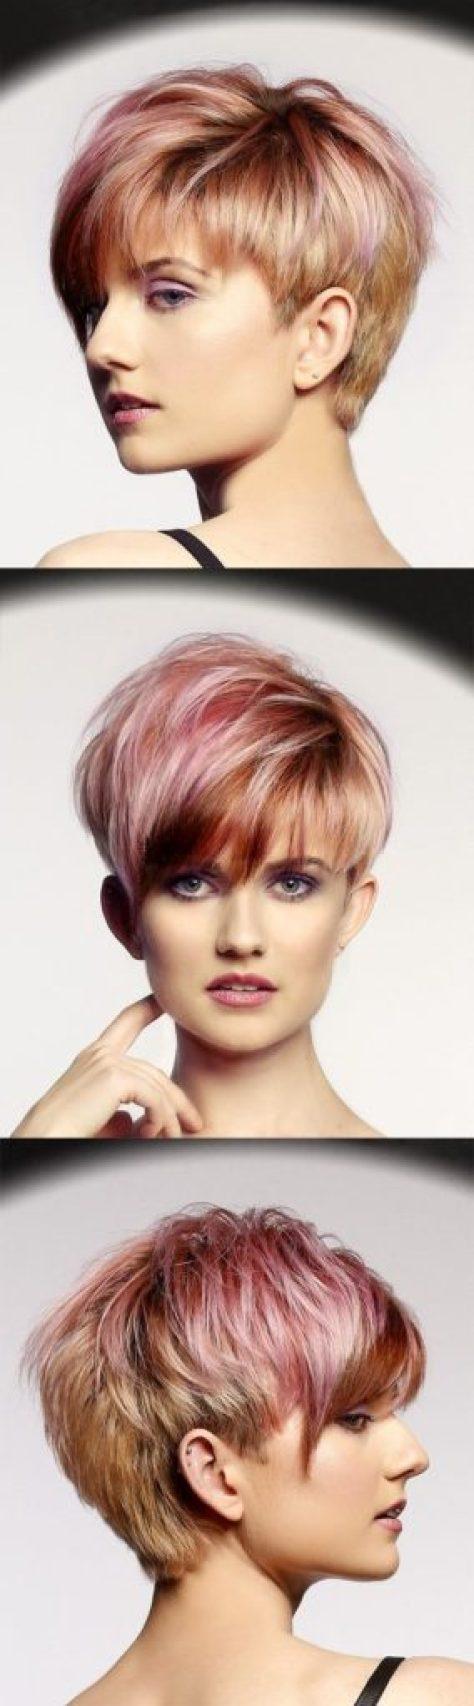 Short Straight Pink Pixie